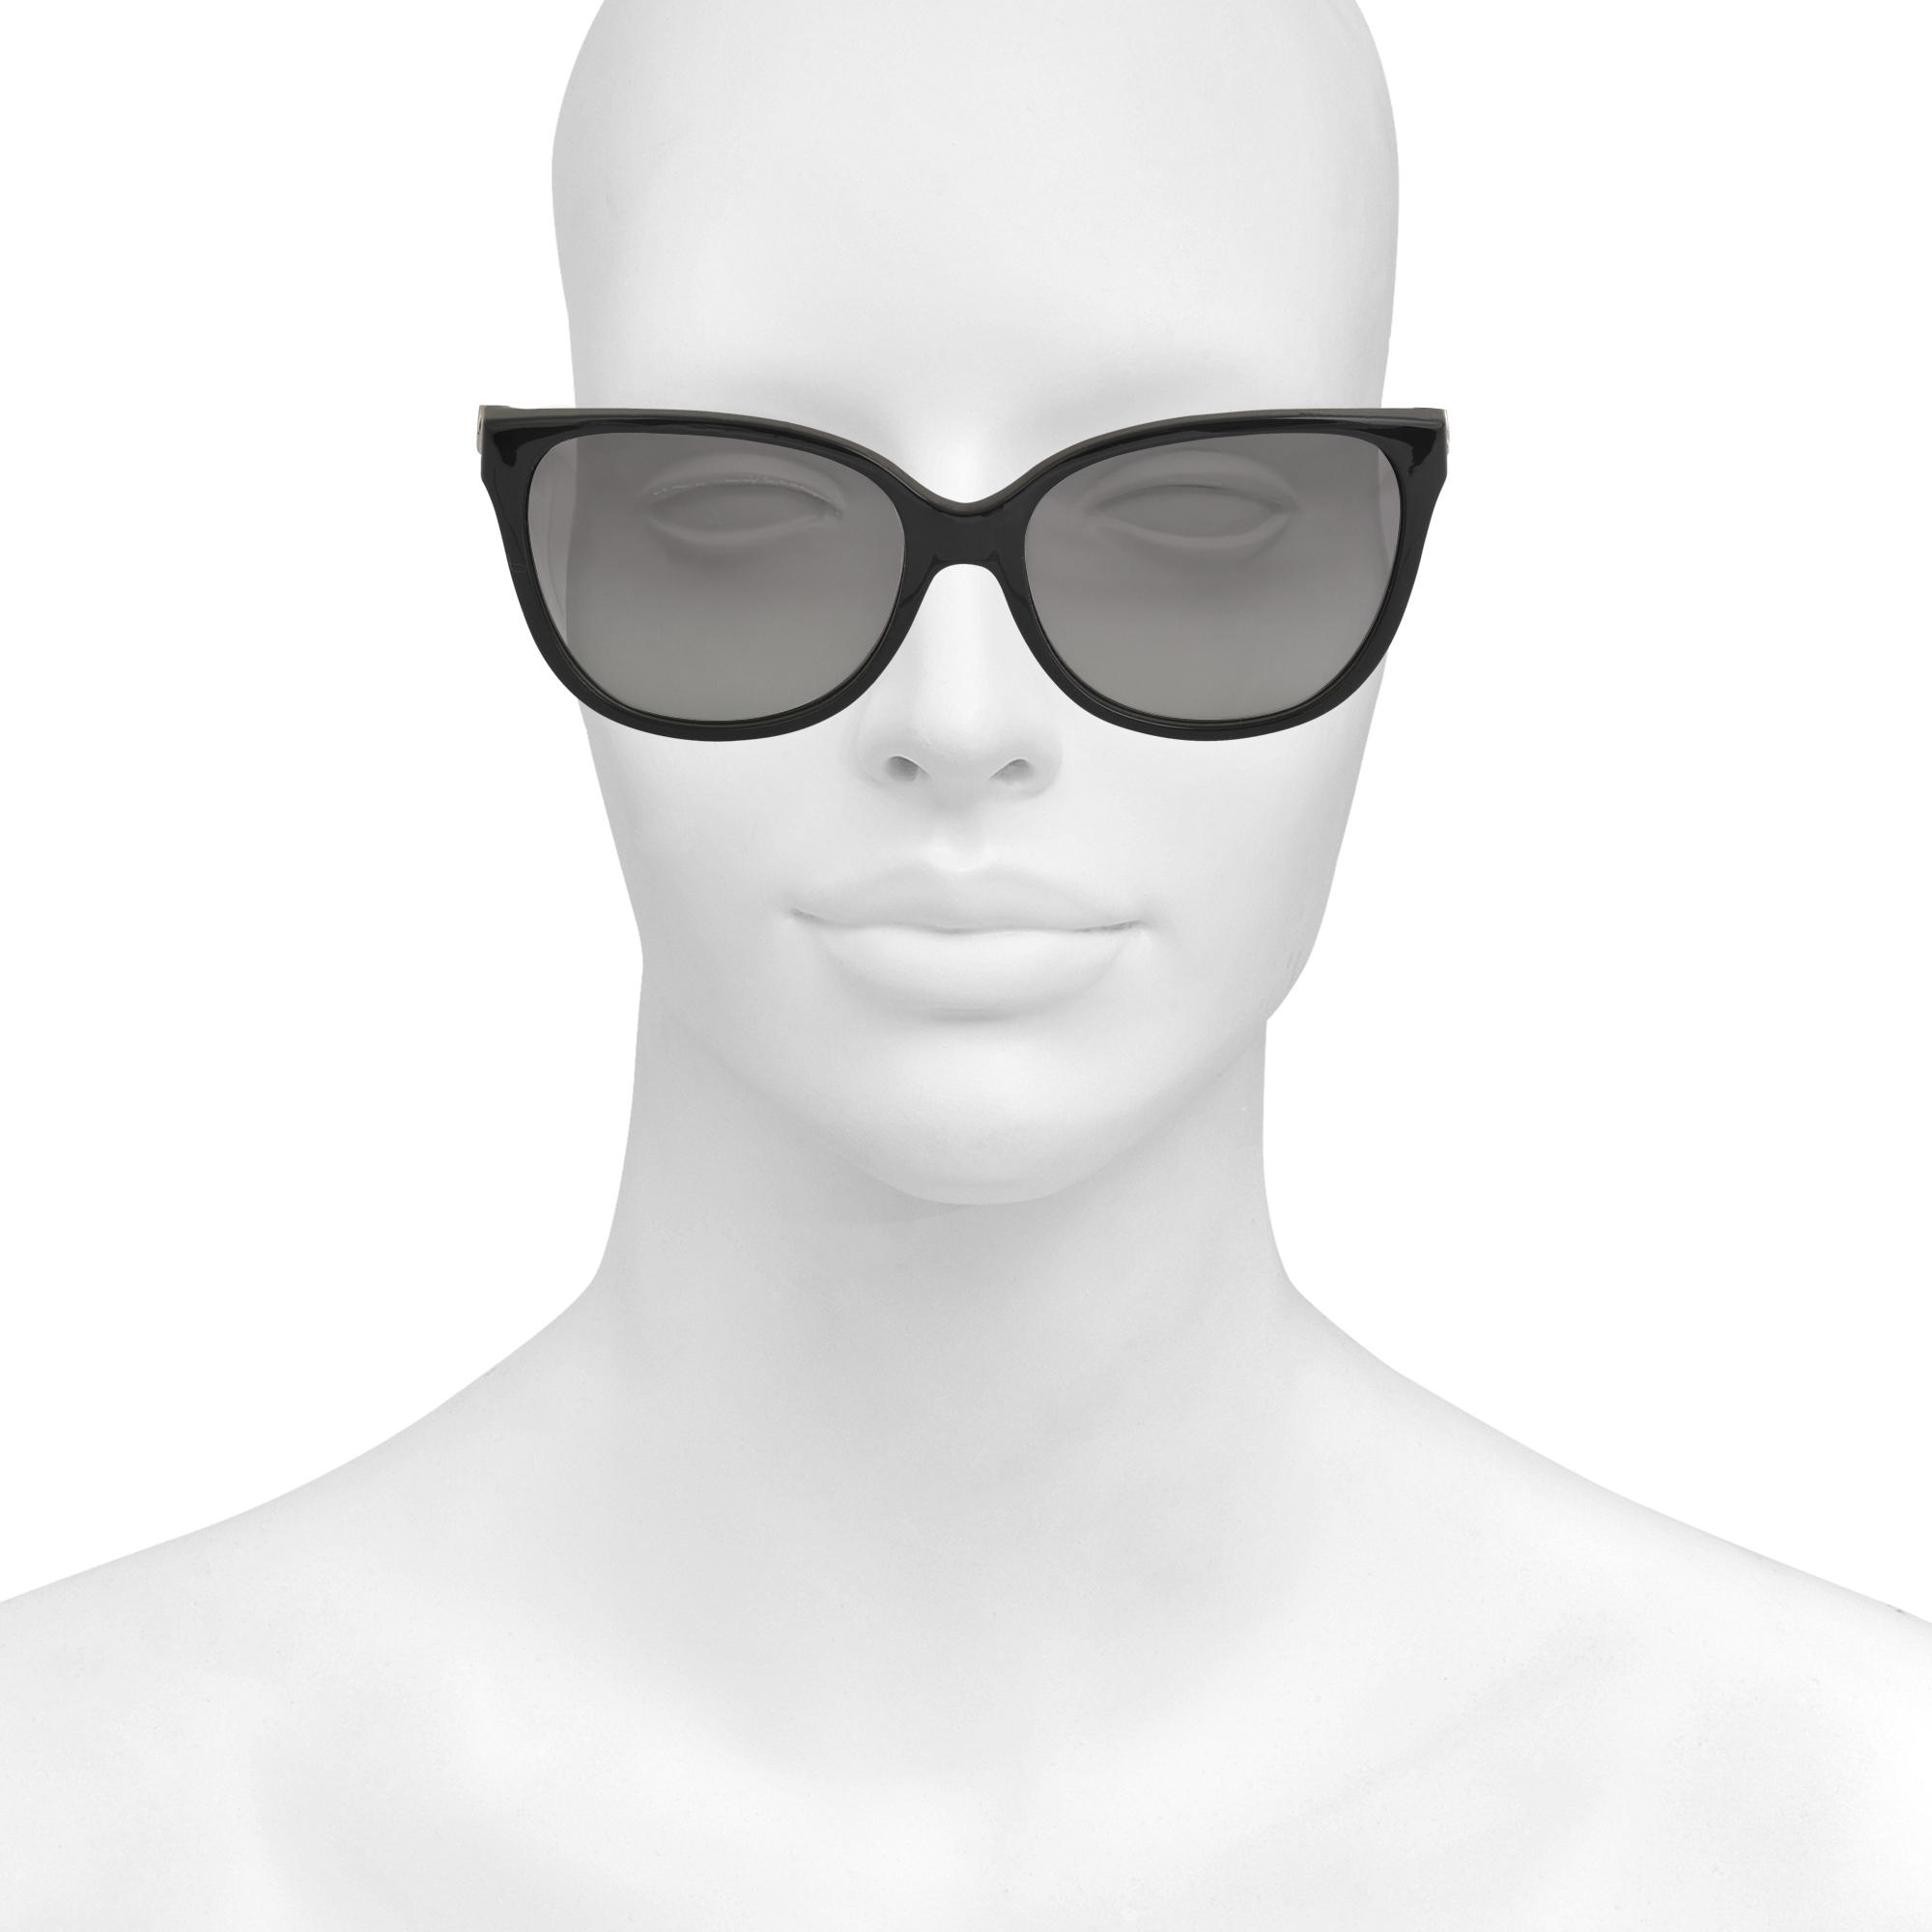 ce9ba22d3fd Lyst - Michael Kors Marrakesh Black Sunglasses Mk6006 in Black